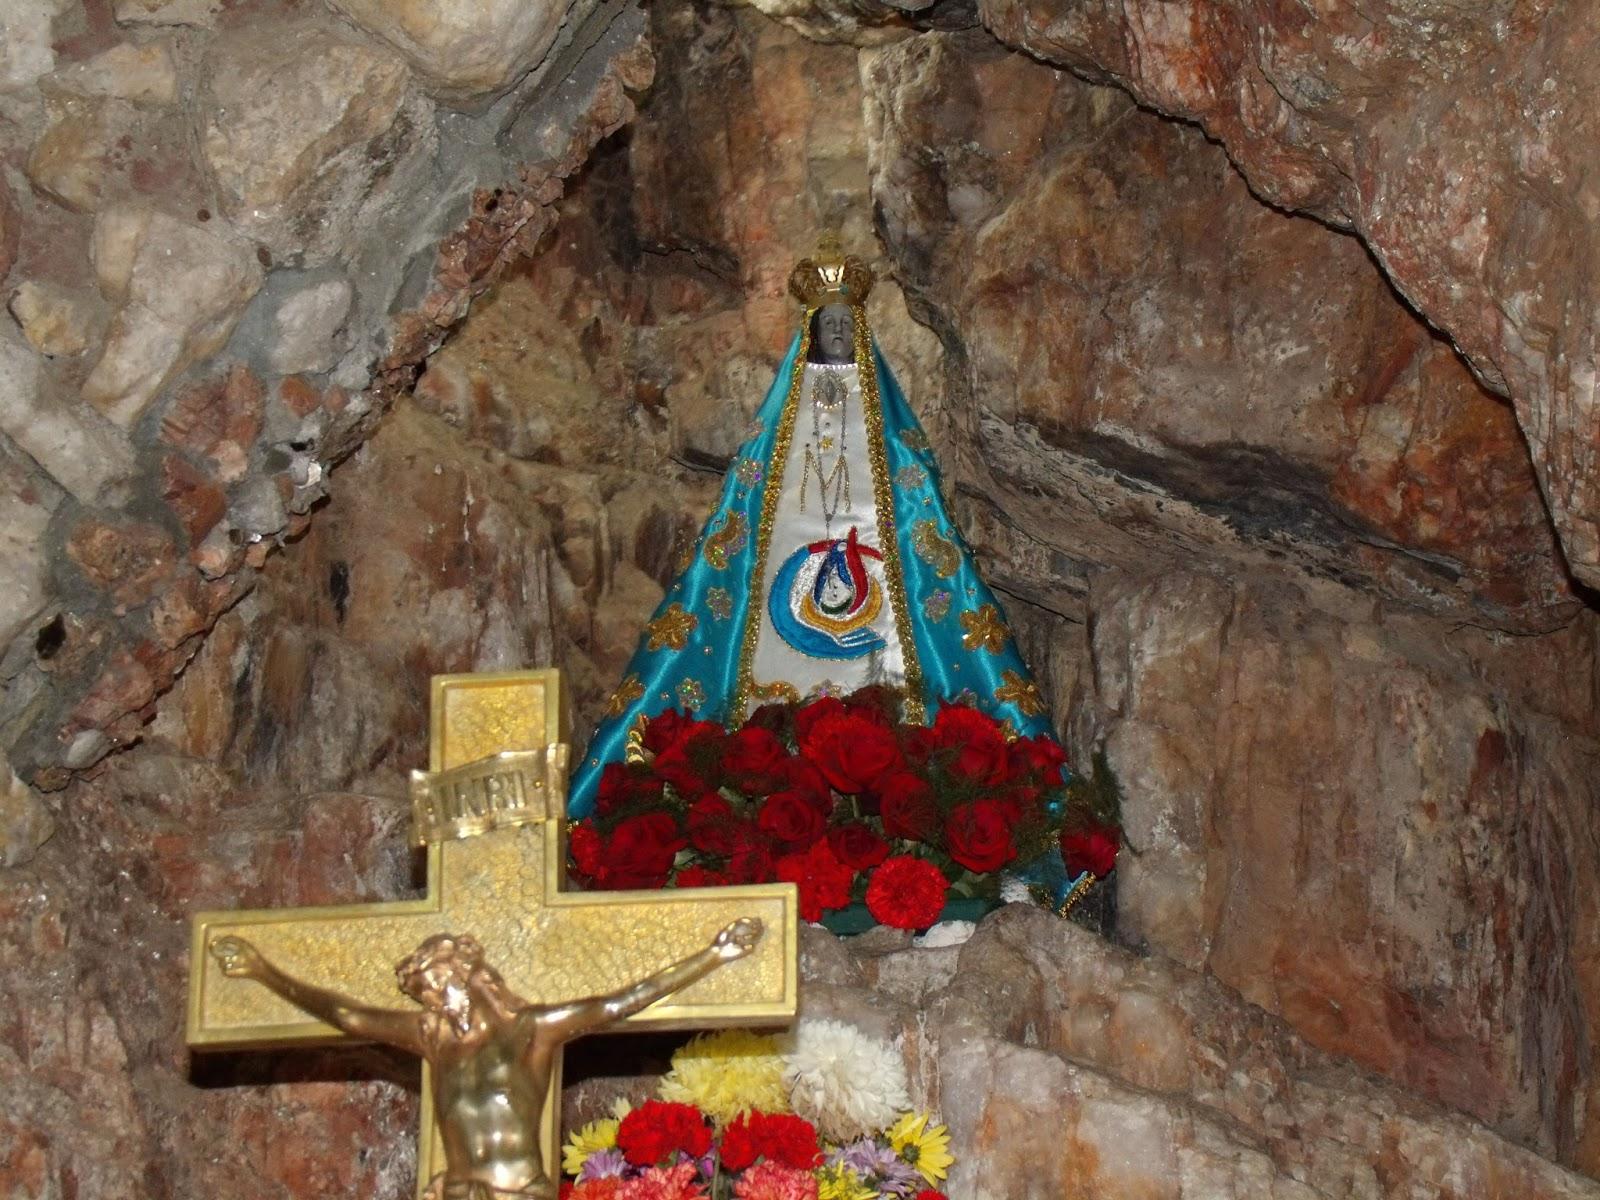 Virgen del Valle, la Milagrosa Patrona de Catamarca, Argentina (8 dic 2da. Pascua)